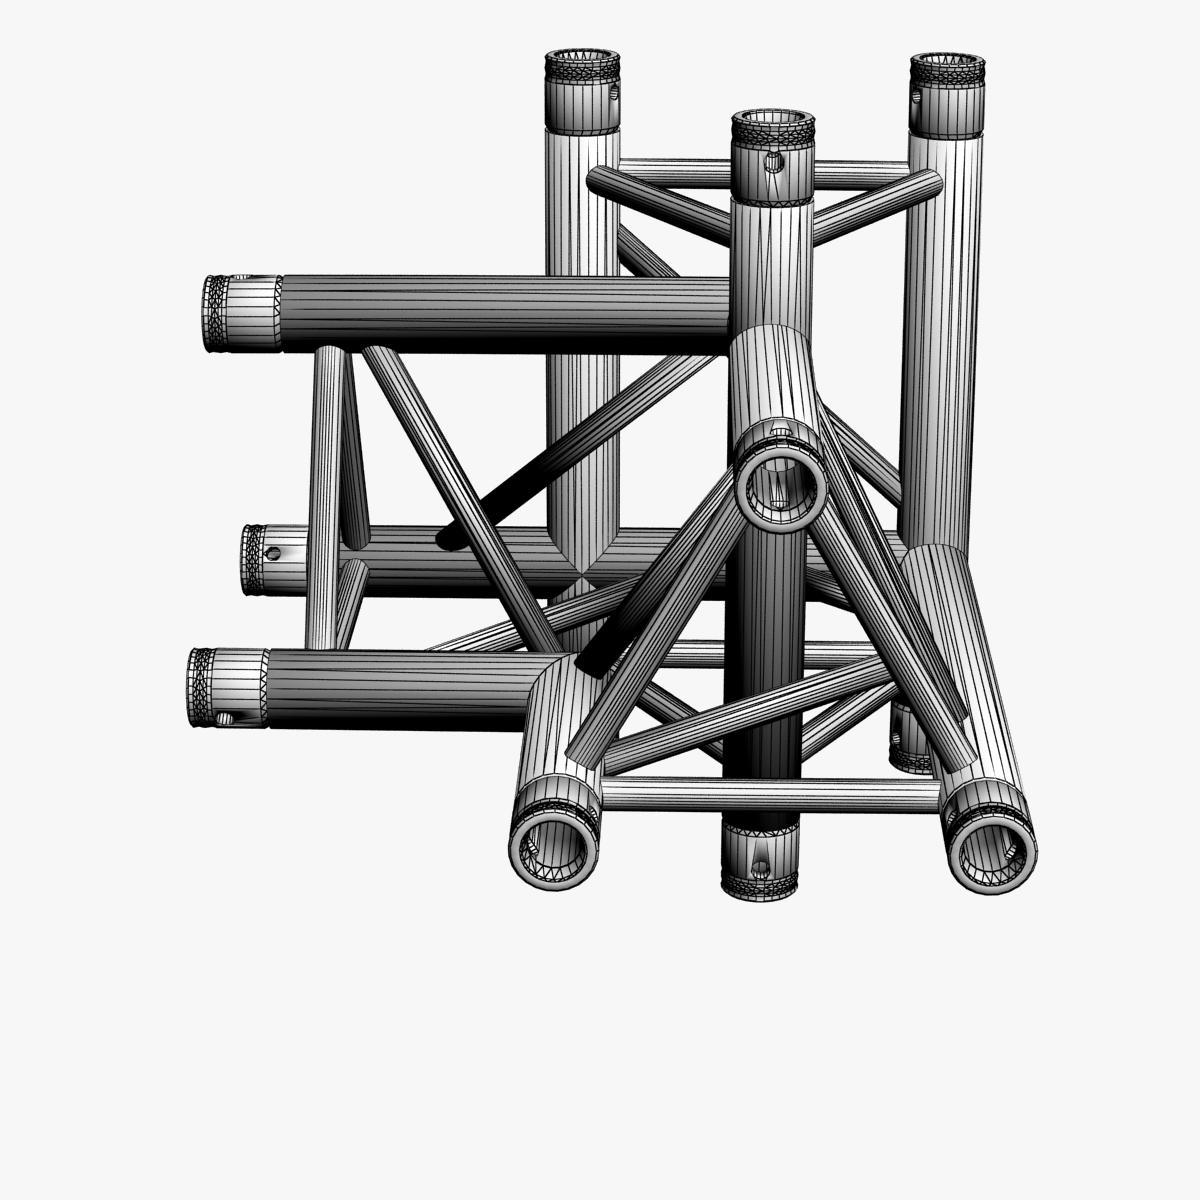 triangular trusses (collection 55 modular pieces) 3d model 3ds max dxf fbx c4d dae texture obj 216243